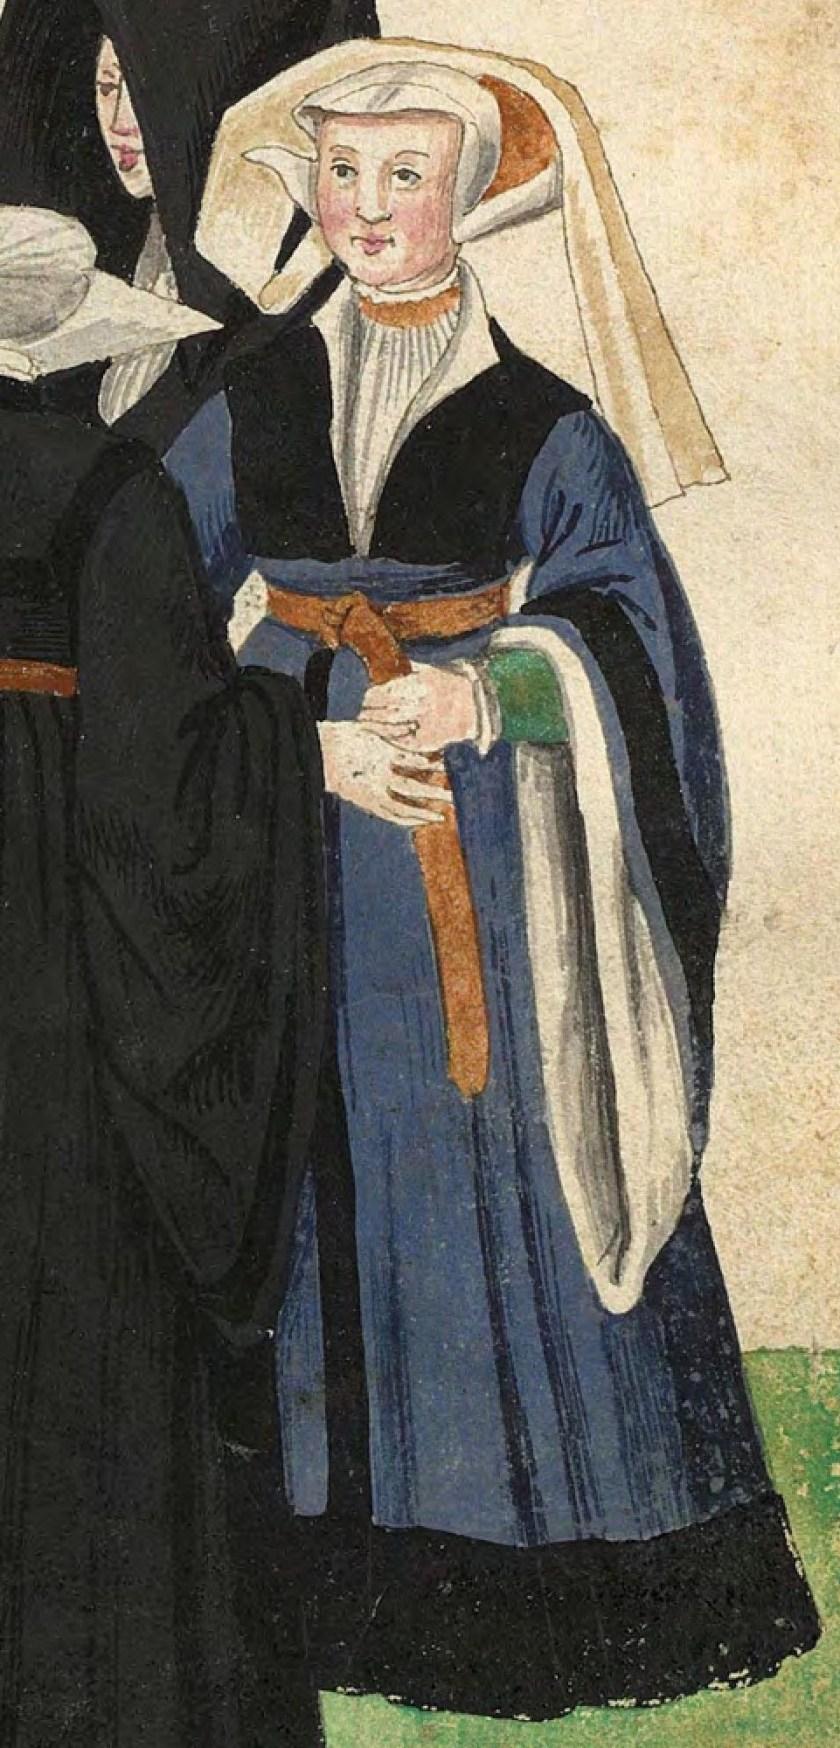 1540s Cologne Burger. Fig. 5, plate 45r, Codice de trajes, Christoph Weiditz. BNE bdh0000052132